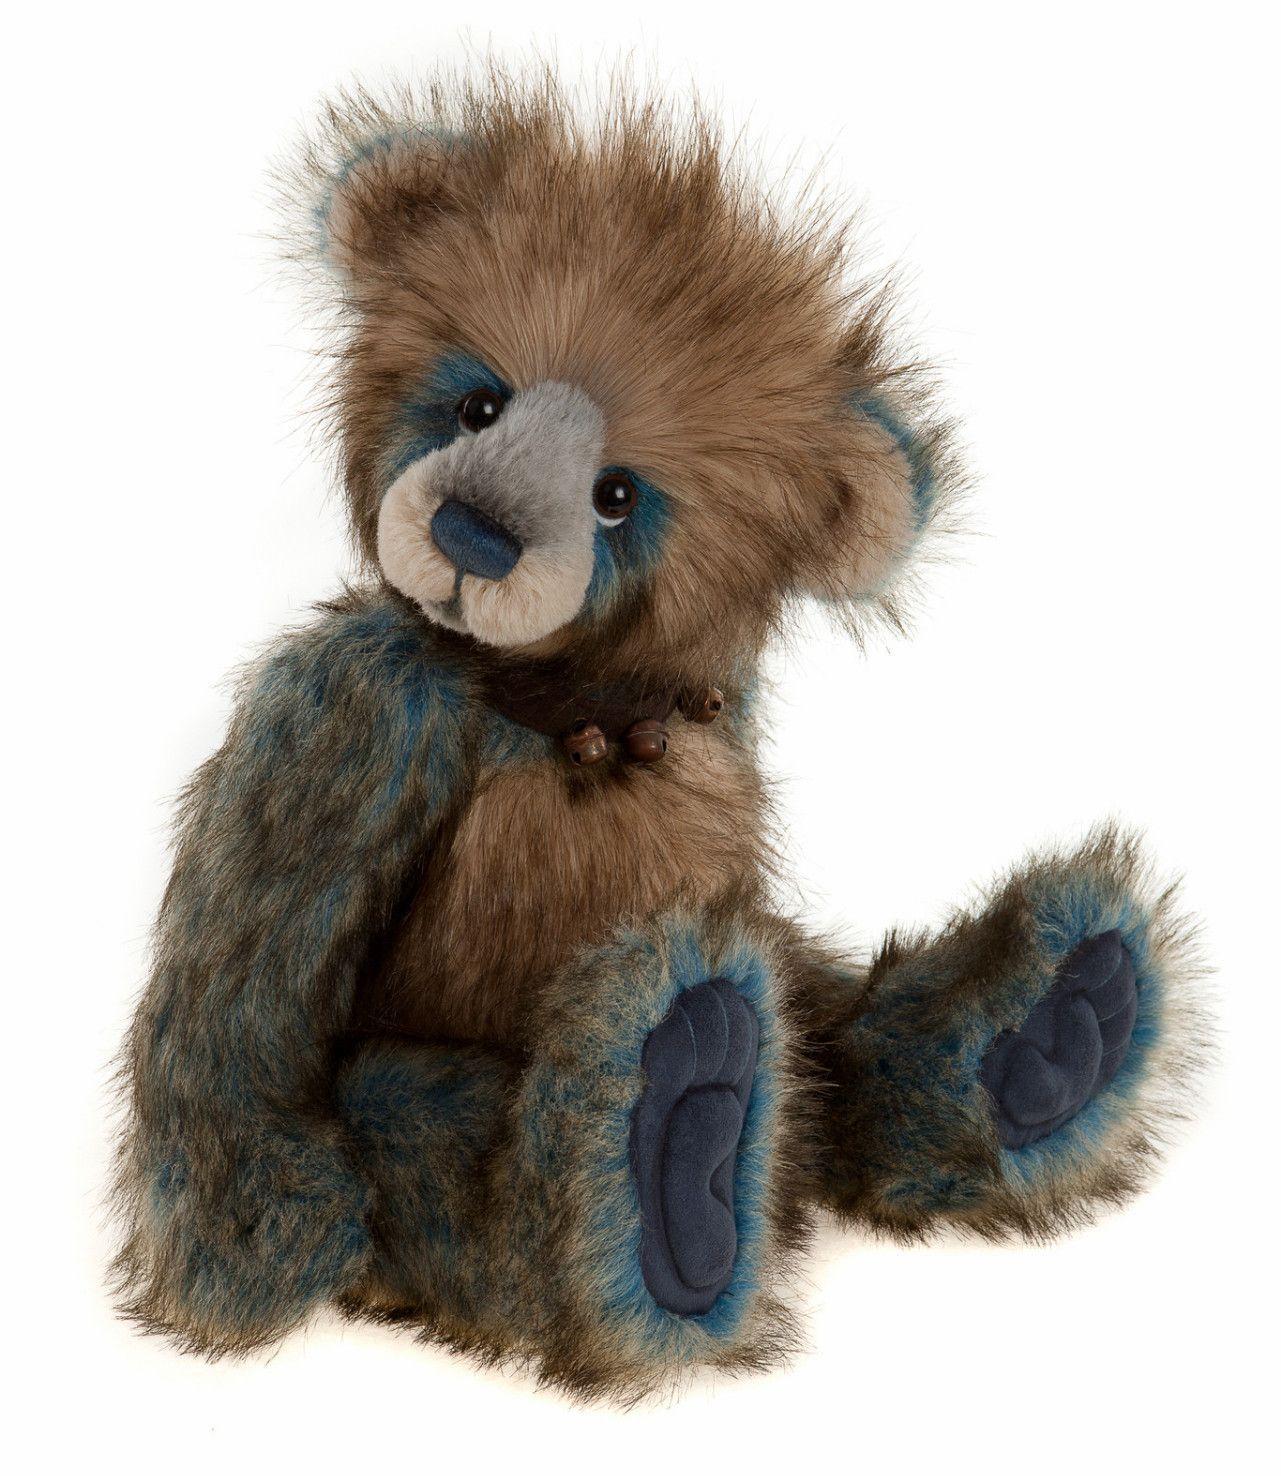 Dakota Teddy Bear - Charlie Bears